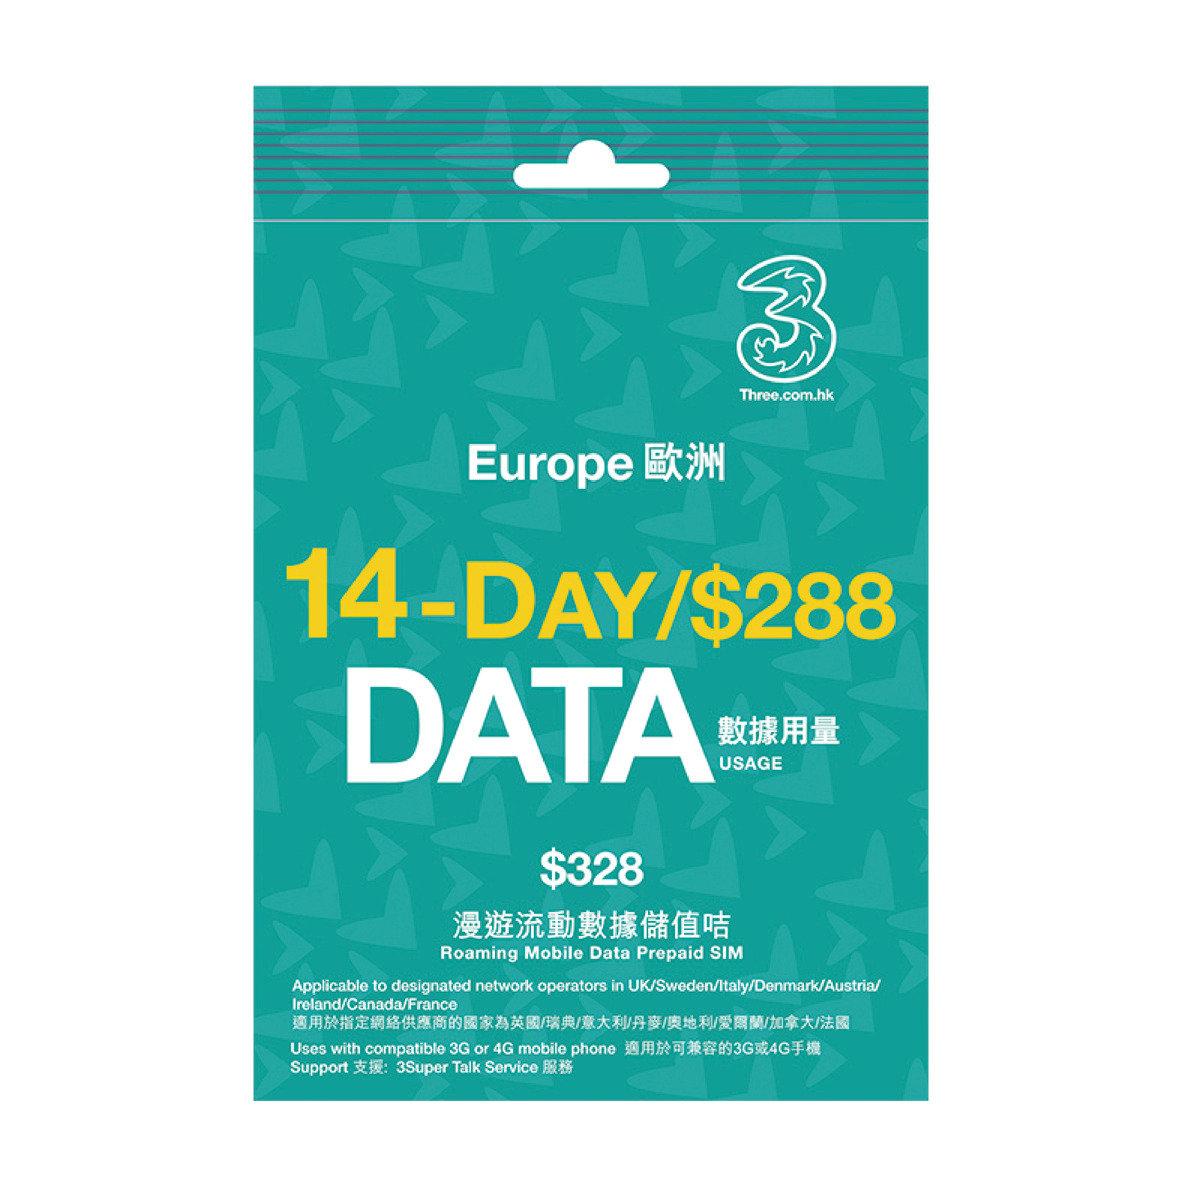 3HK $328 4G LTE 漫遊數據儲值咭Prepaid Sim(歐洲) (expiry date:31-12-2017)